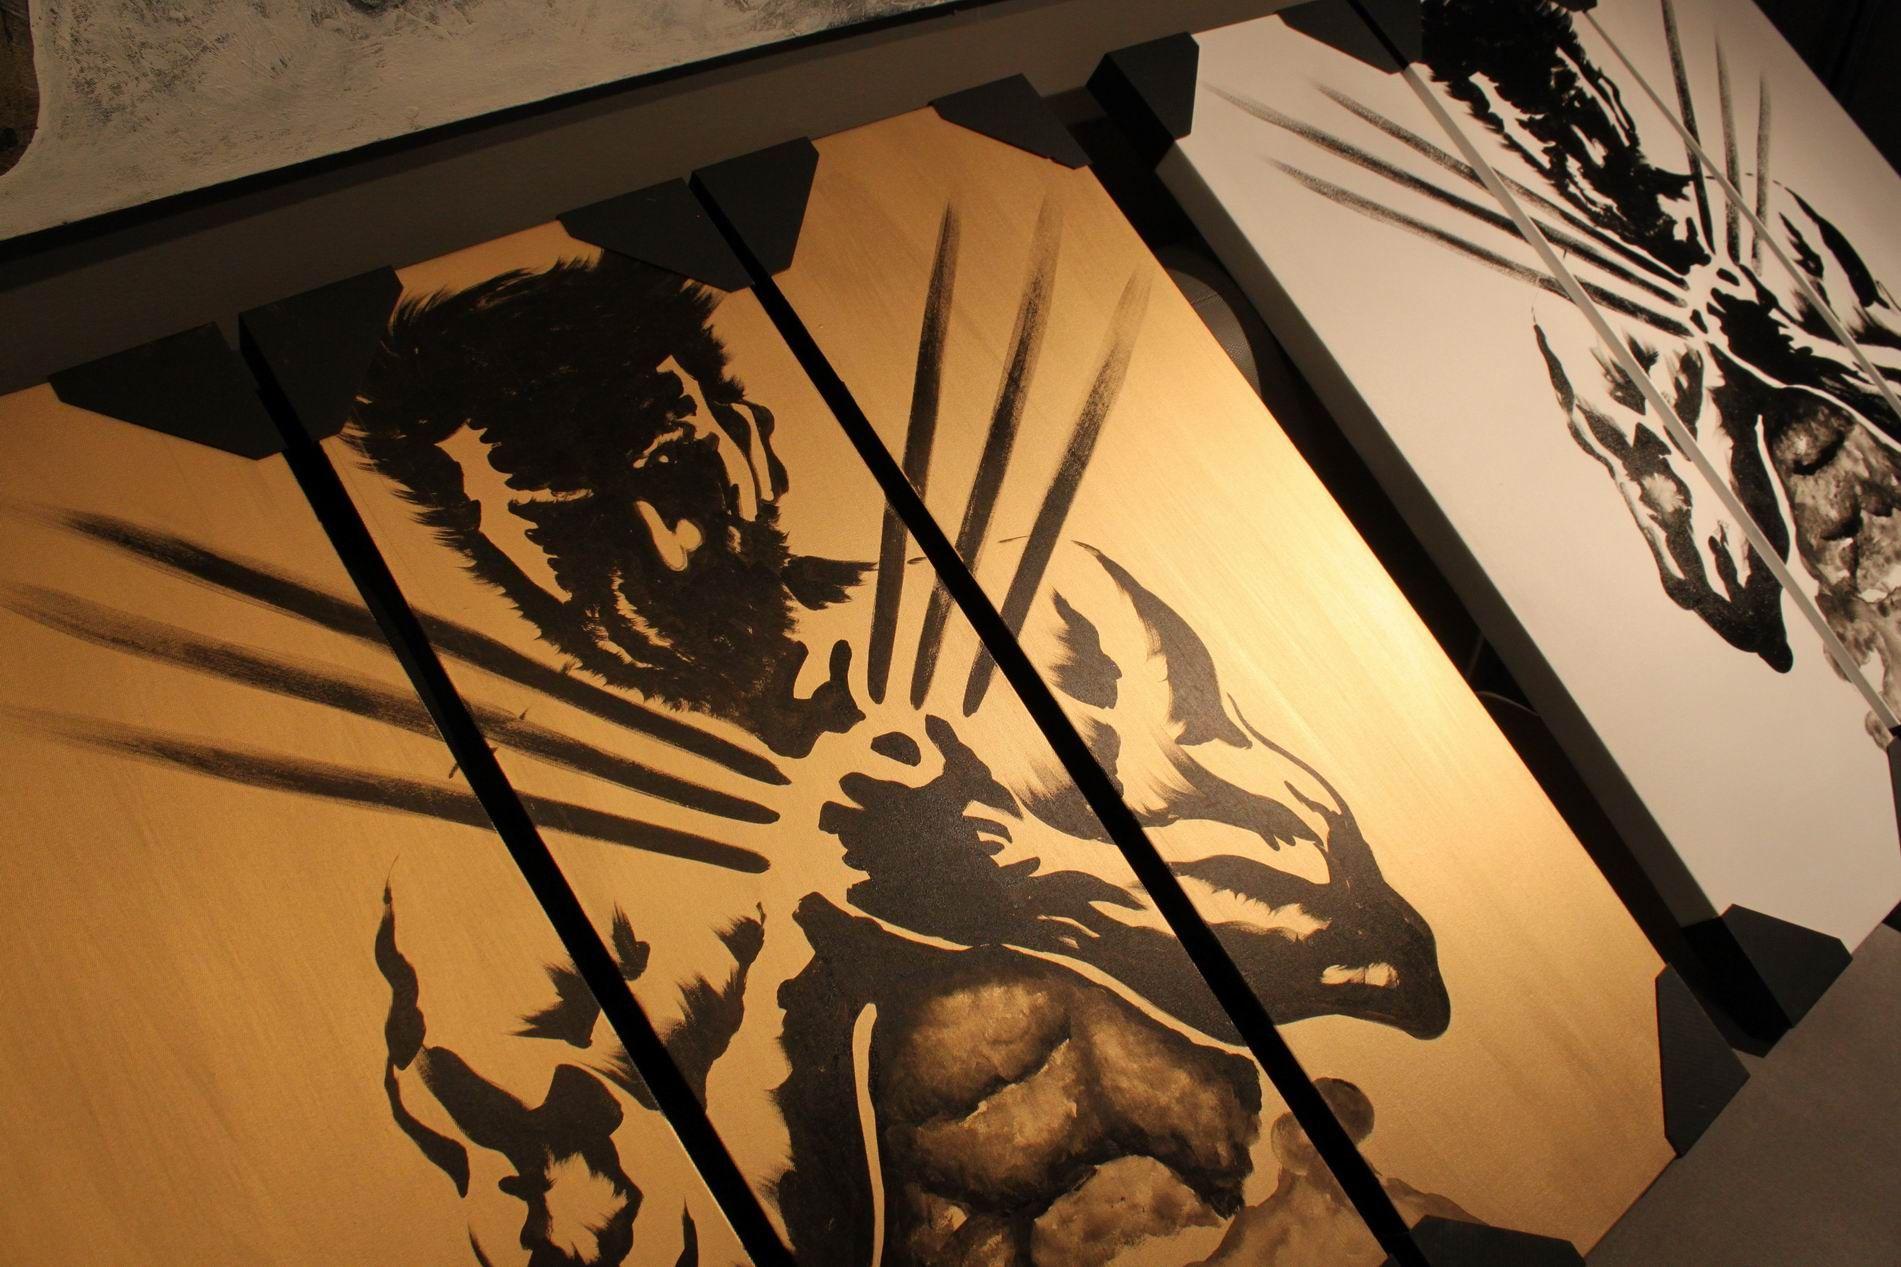 Gold black logan wolverine calligraphy brush movie fan art black